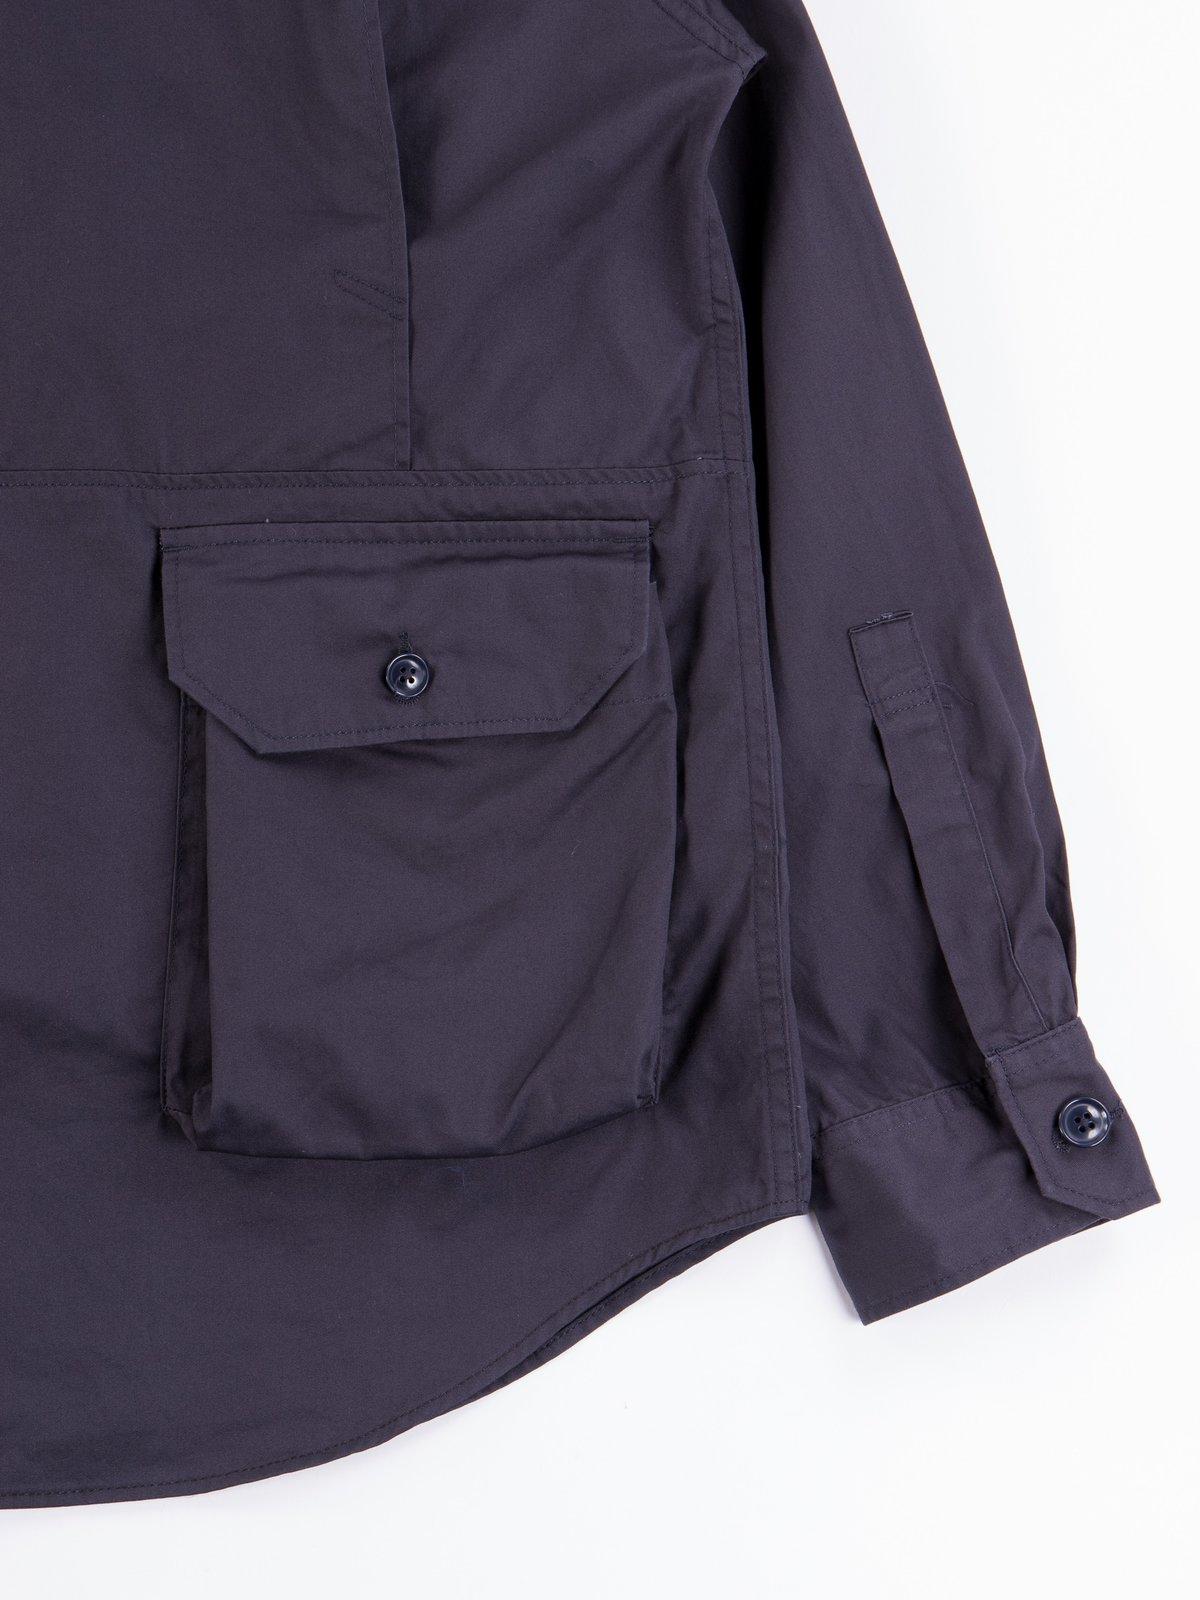 Dark Navy Highcount Twill Explorer Shirt Jacket - Image 8